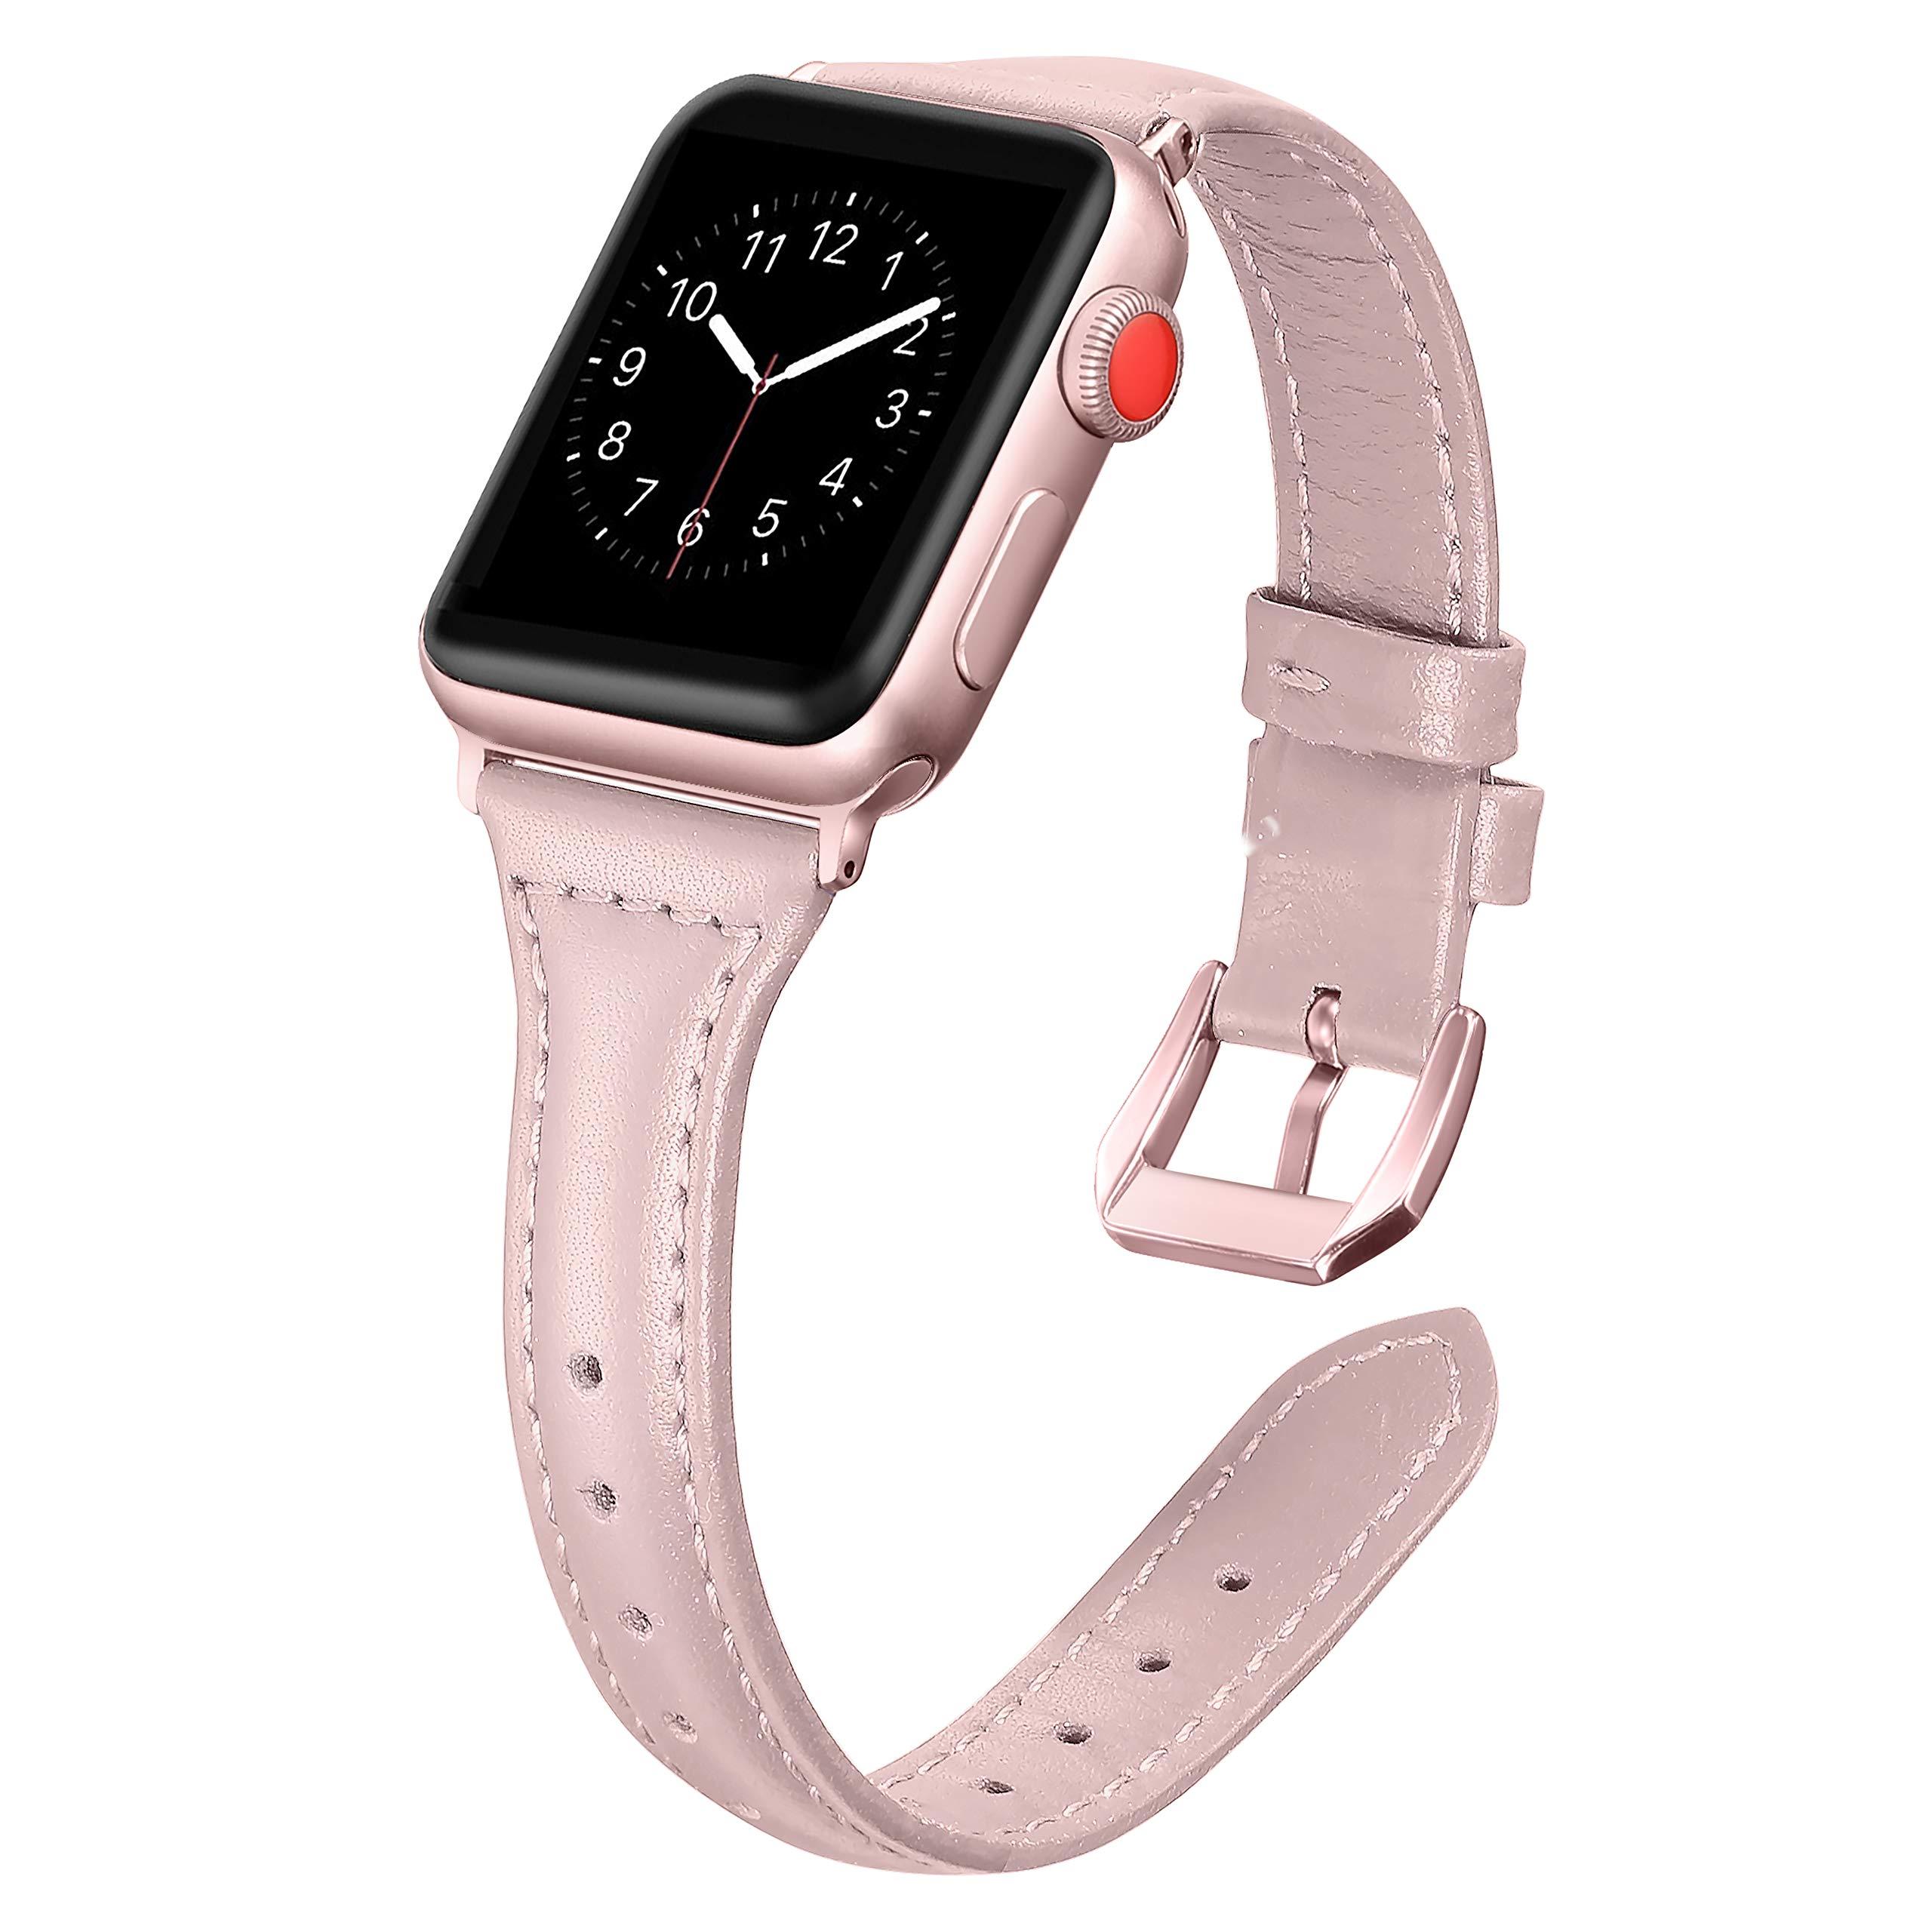 Malla Cuero para Apple Watch (38/40mm) SECBOLT [7J4WMQPC]